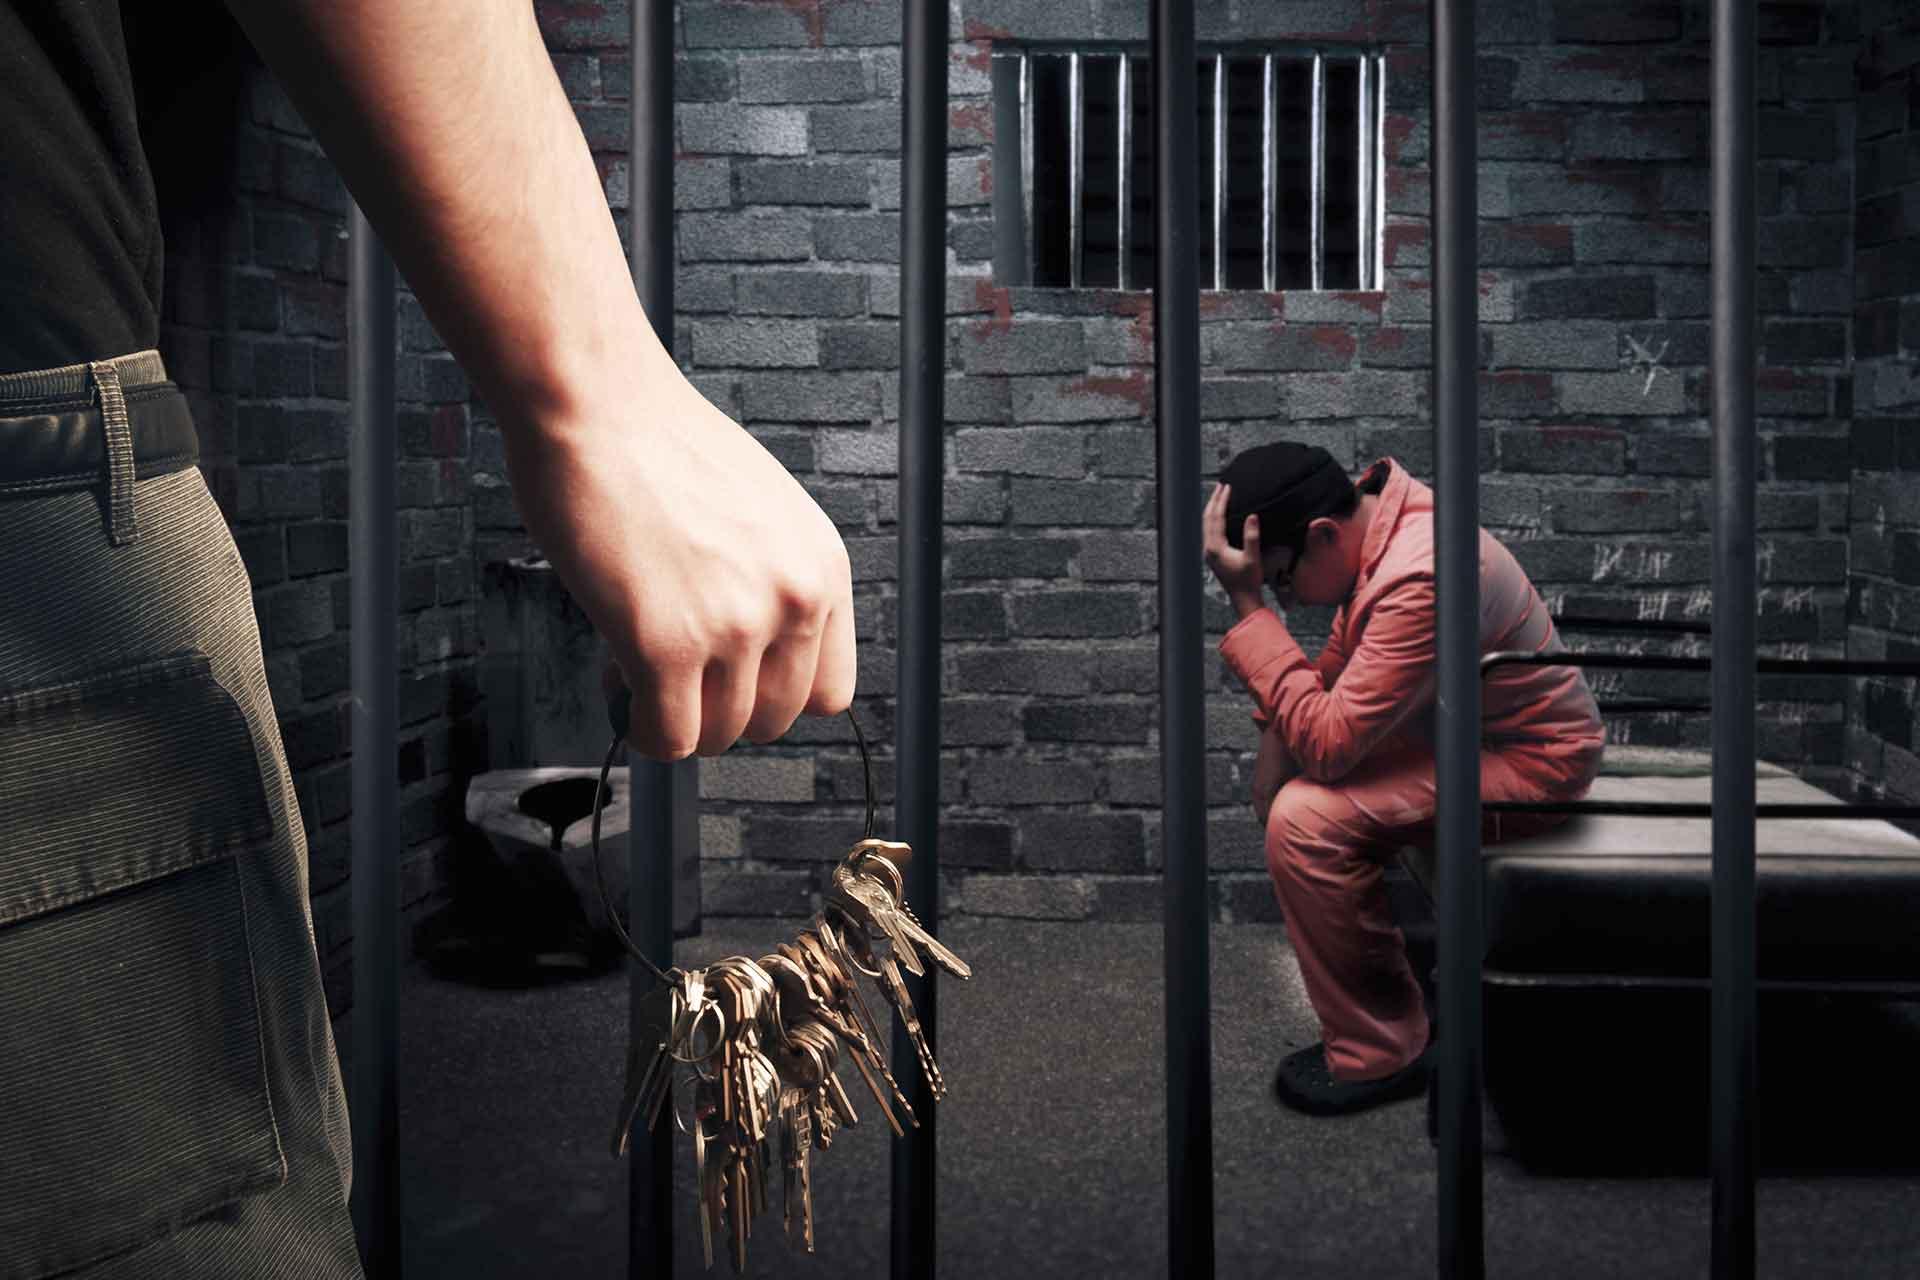 Verlof strafrecht advocaat - Weening Strafrechtadvocaten